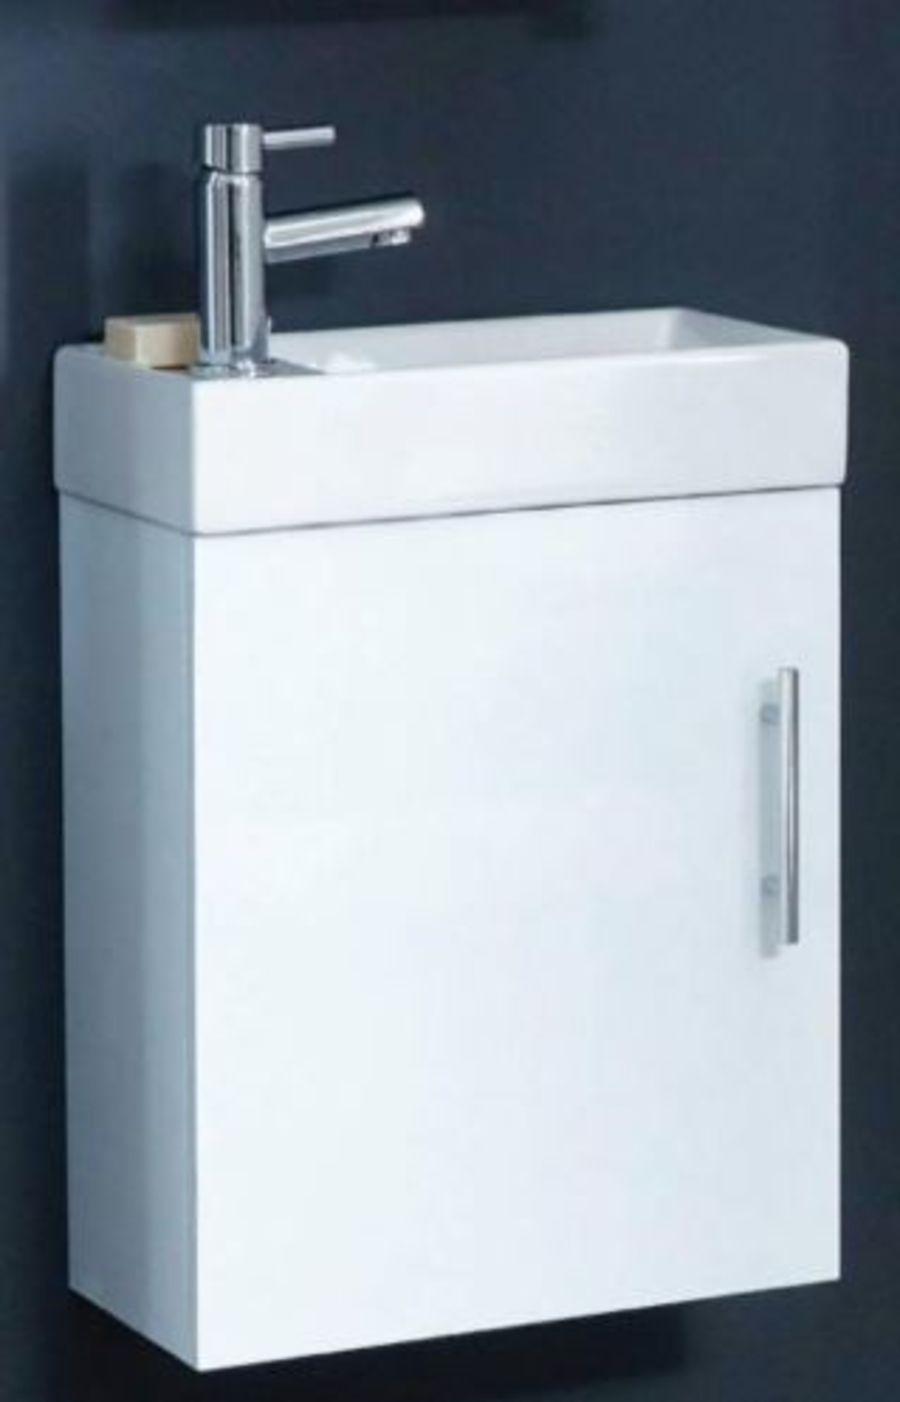 Lanza 400mm Wall Hung Cloakroom Basin & Unit